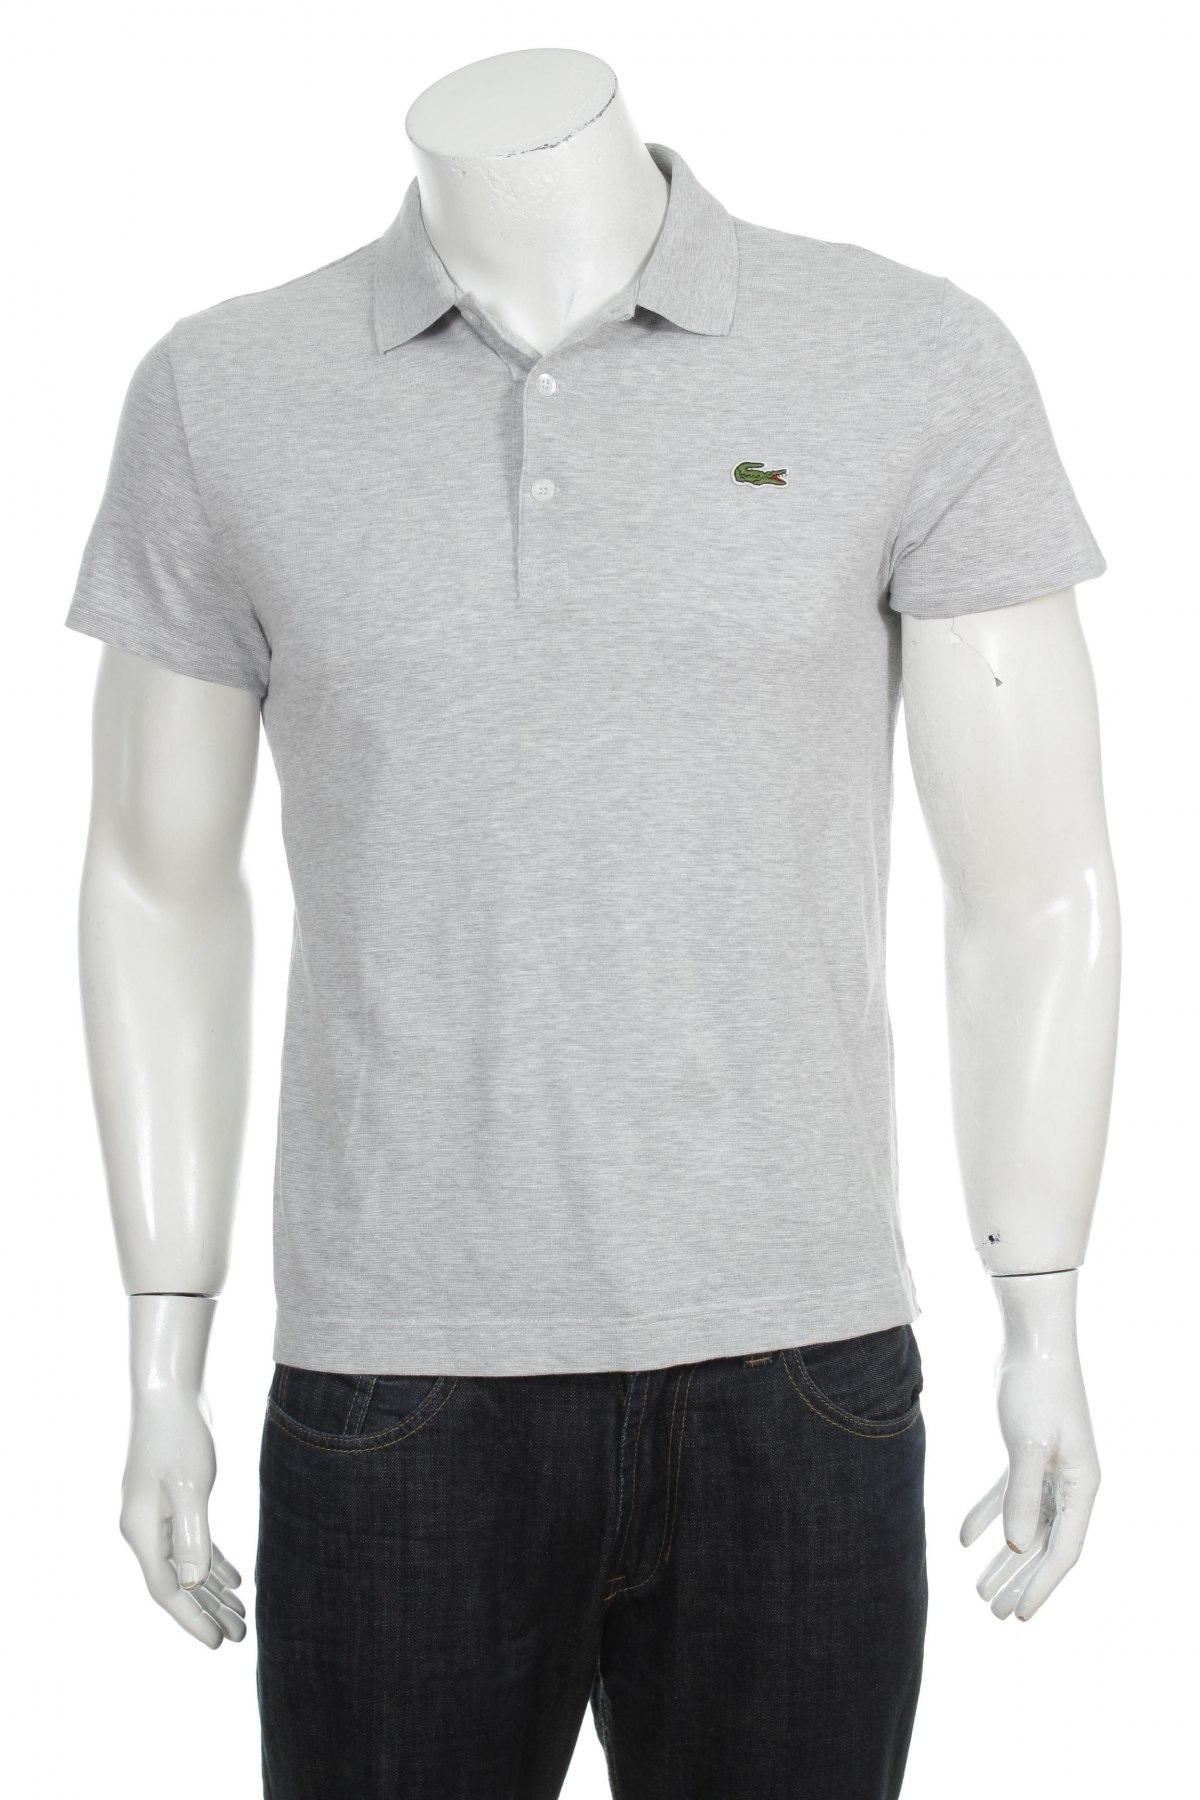 a478aeb01087 Ανδρικό t-shirt Lacoste - σε συμφέρουσα τιμή στο Remix -  101122872